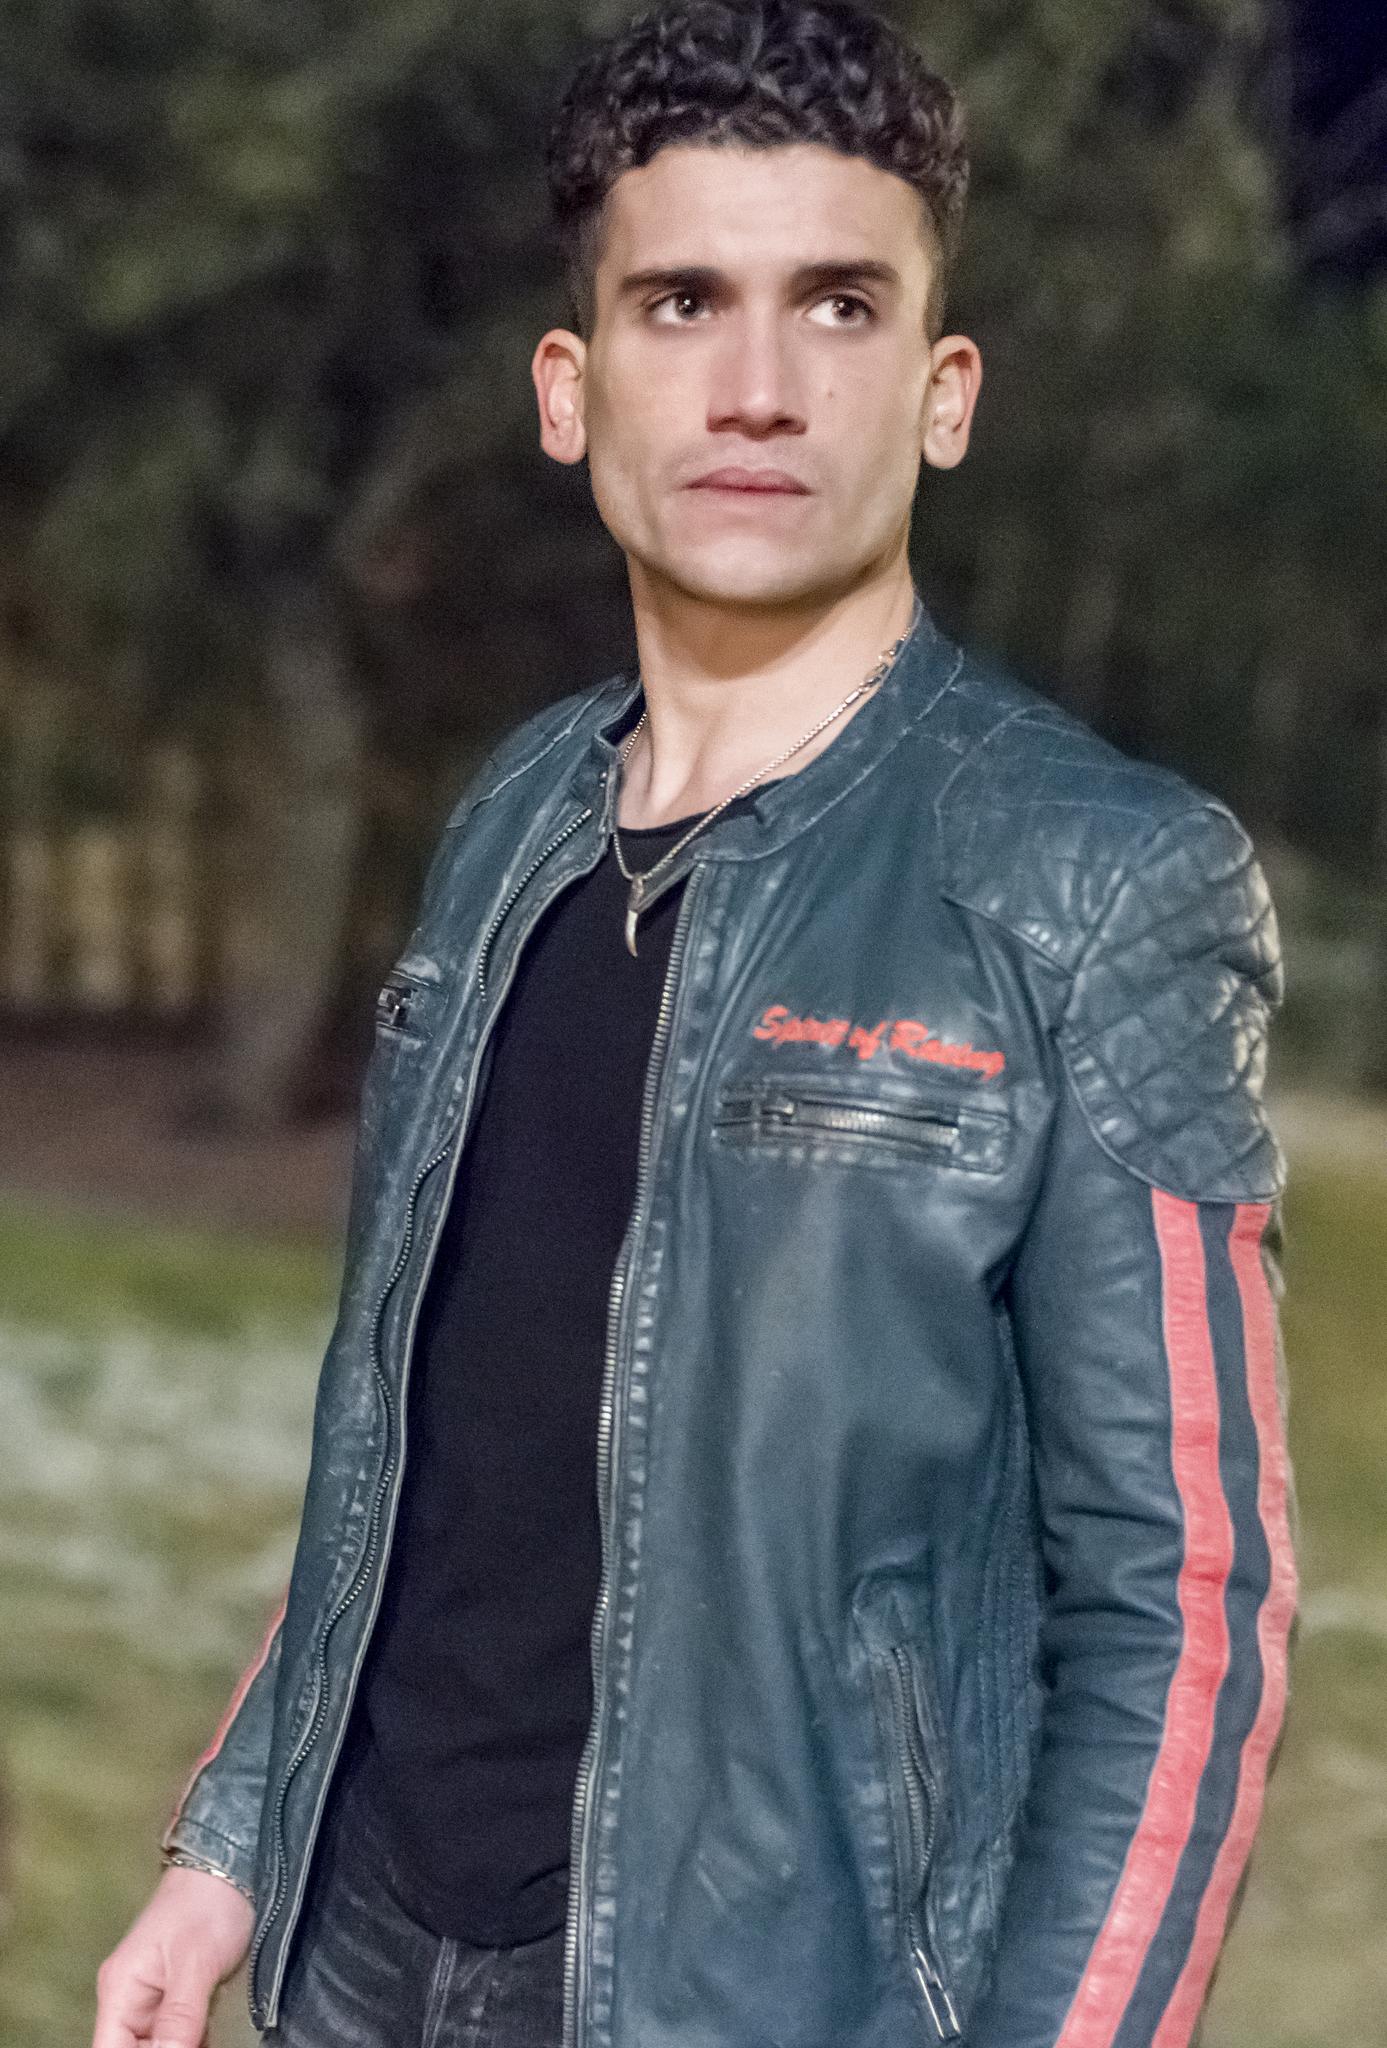 Jaime Lorente - IMDb